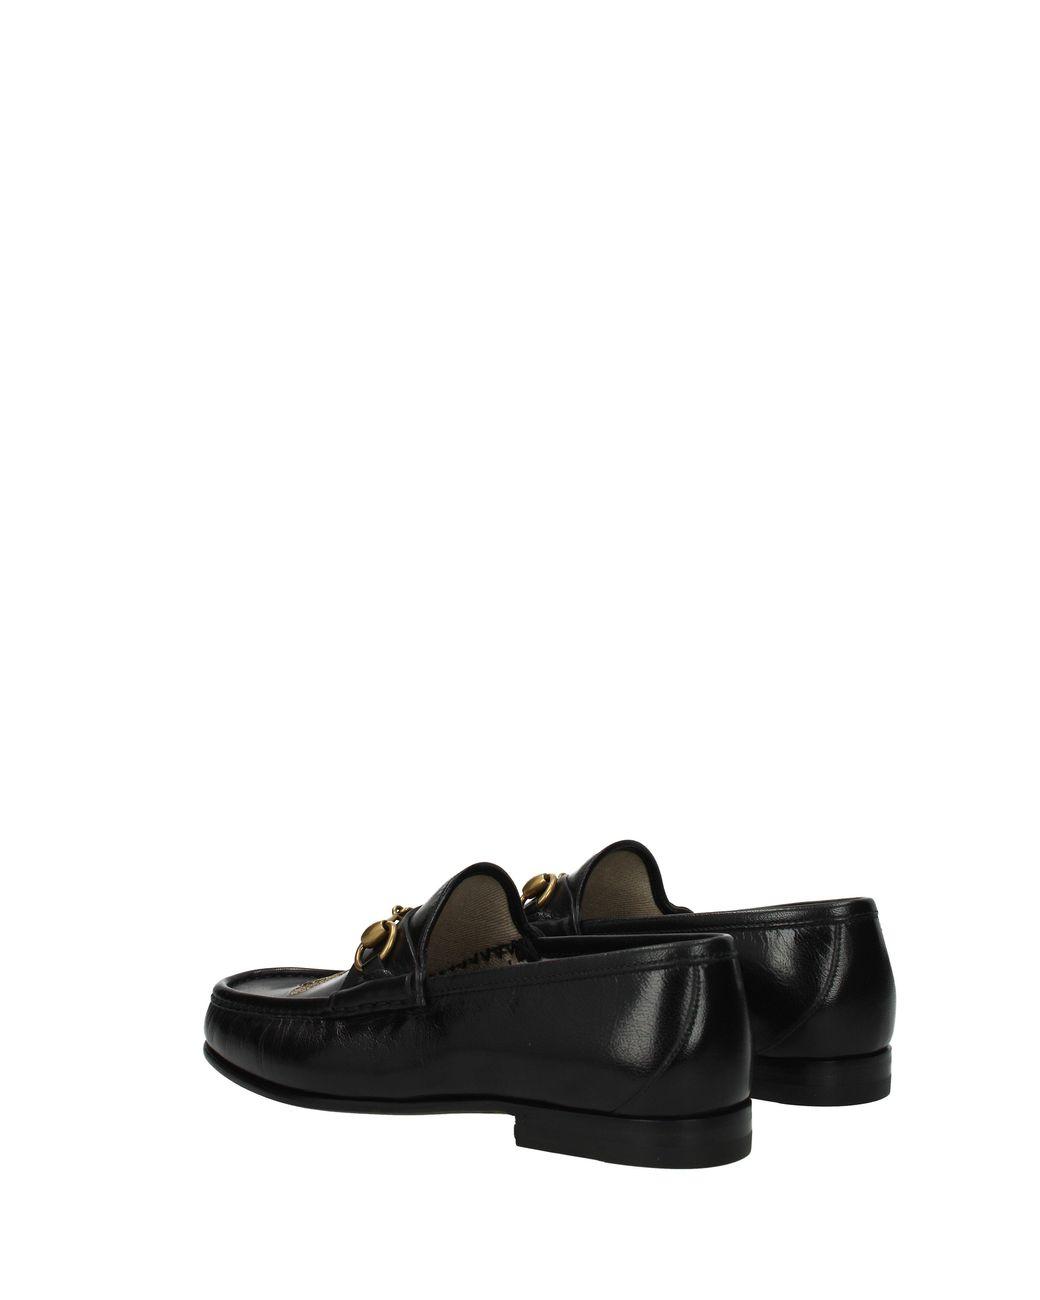 775fae57e Gucci Loafers Men Black in Black for Men - Lyst